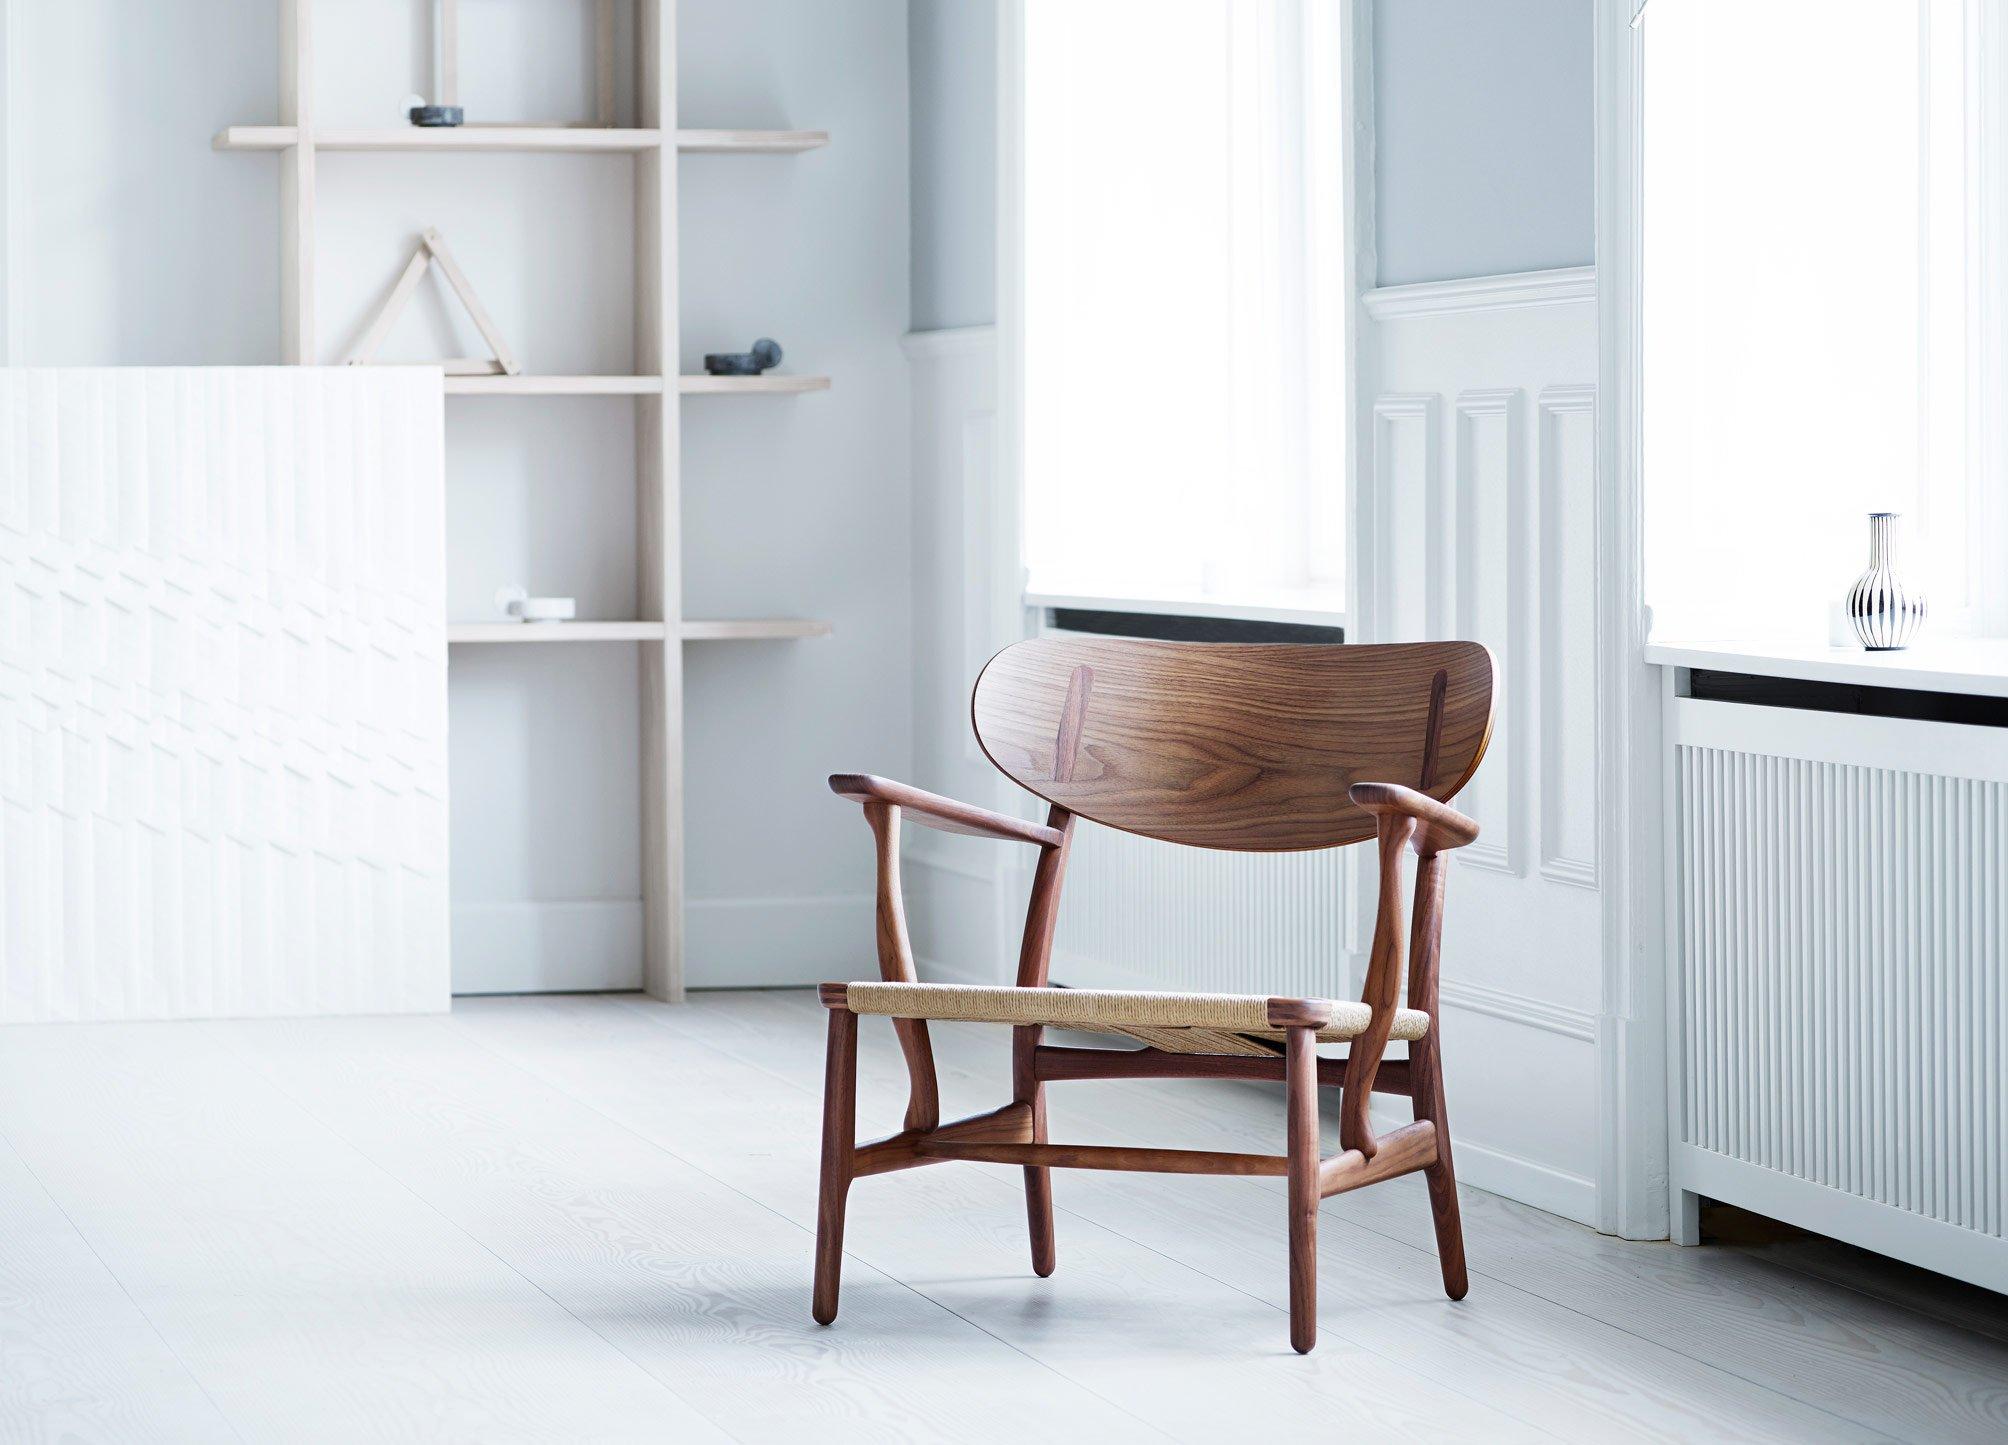 hans wegner peacock chair. Hans Wegner Peacock Chair